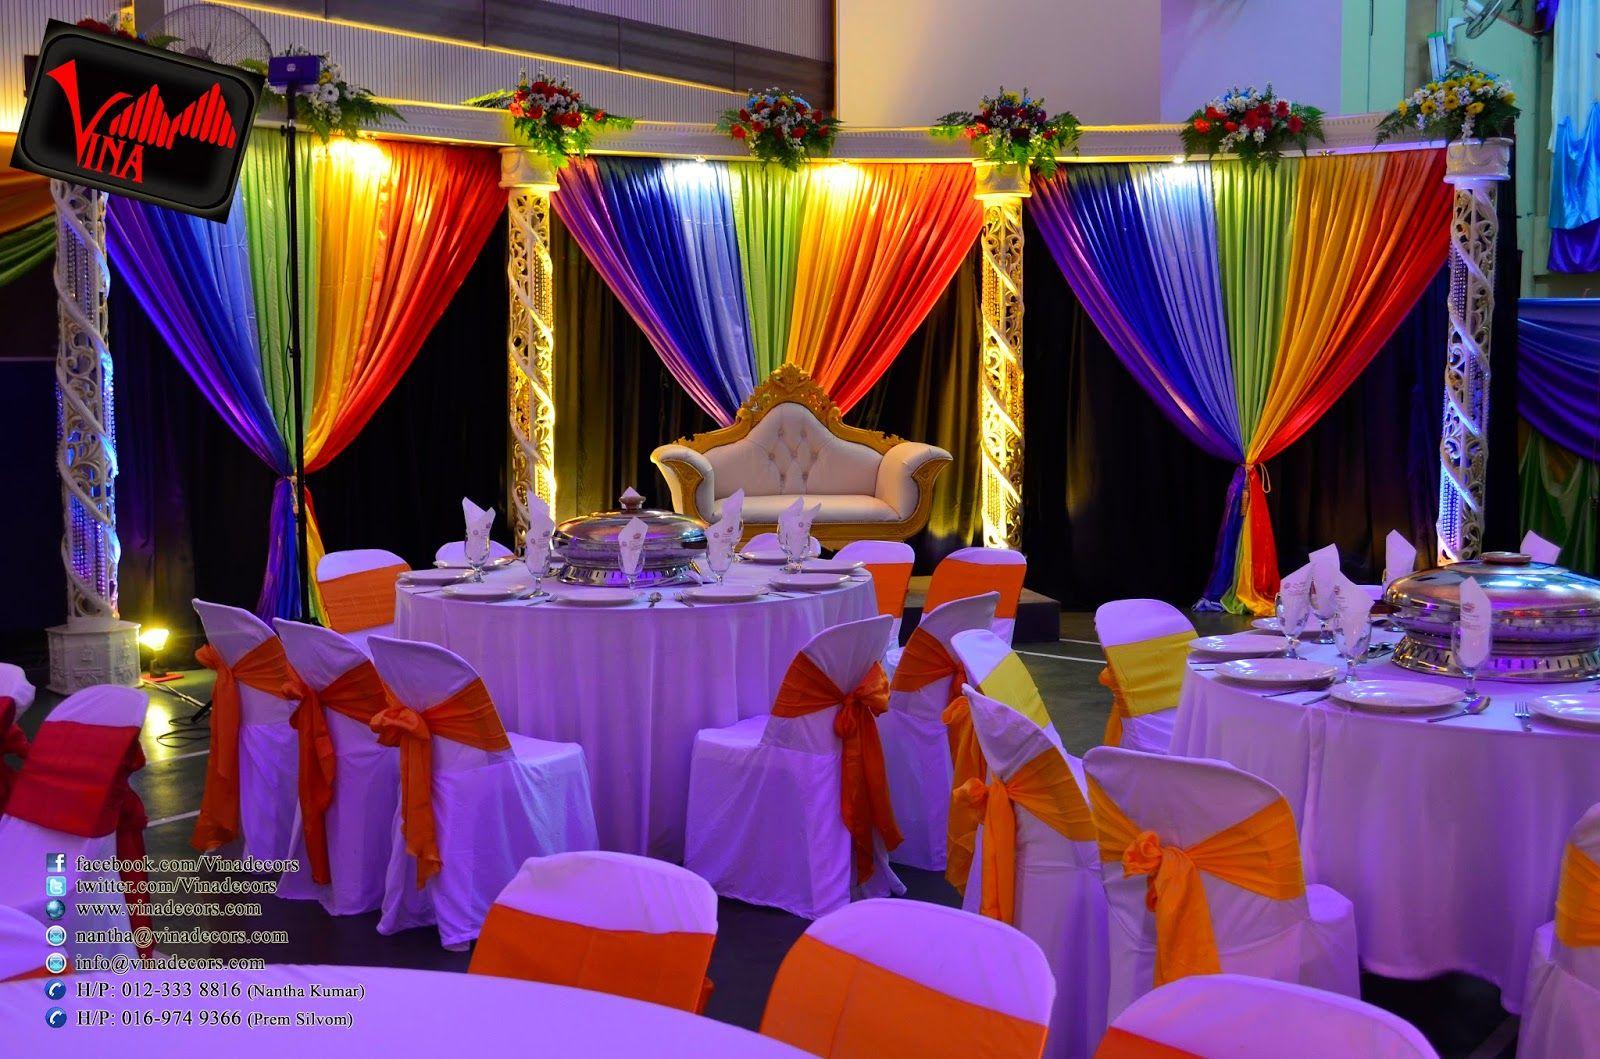 Rainbow Color Concept Wedding Dinner Decoration At Srjk C Batu 14 Puchong Hall Ledchumanan Weds Nancy Nani On 08th February By Vina Canopy